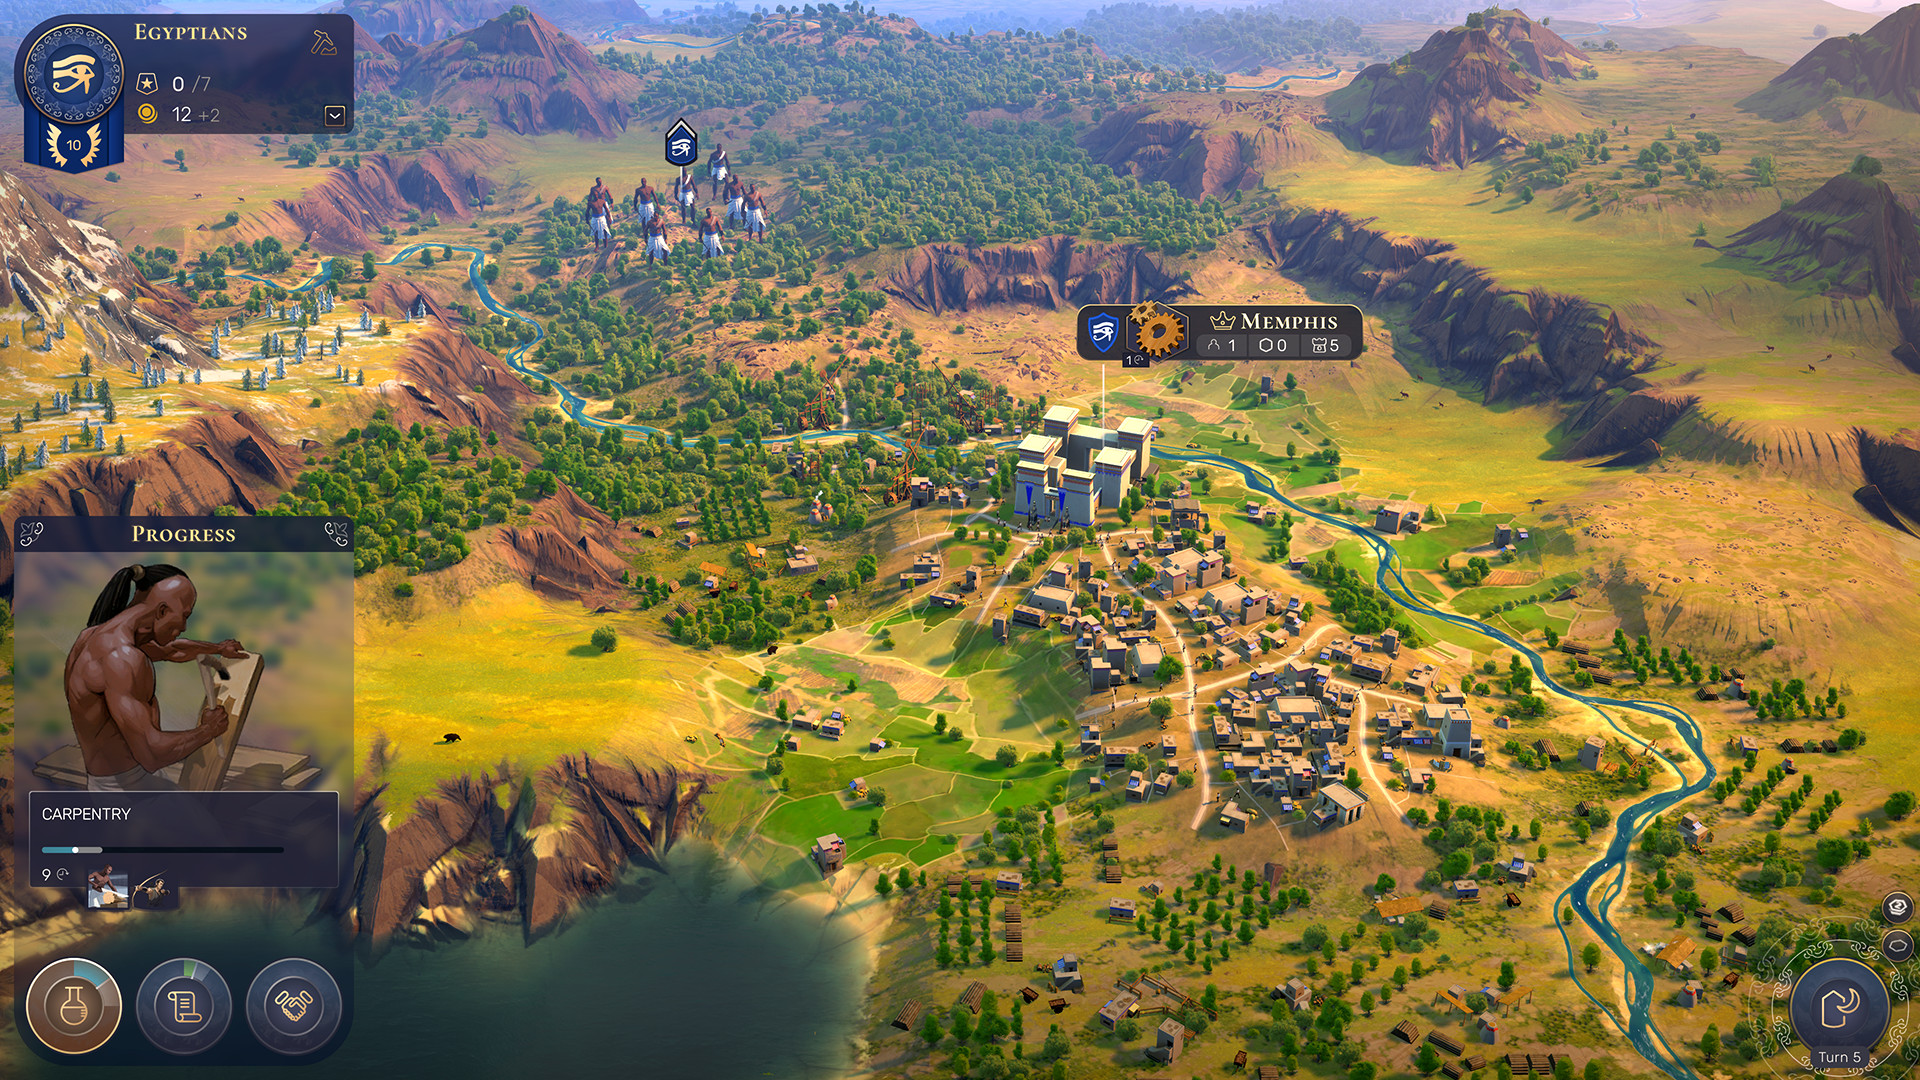 GC 2019:世嘉策略新作《人类》上架Steam 支持中文